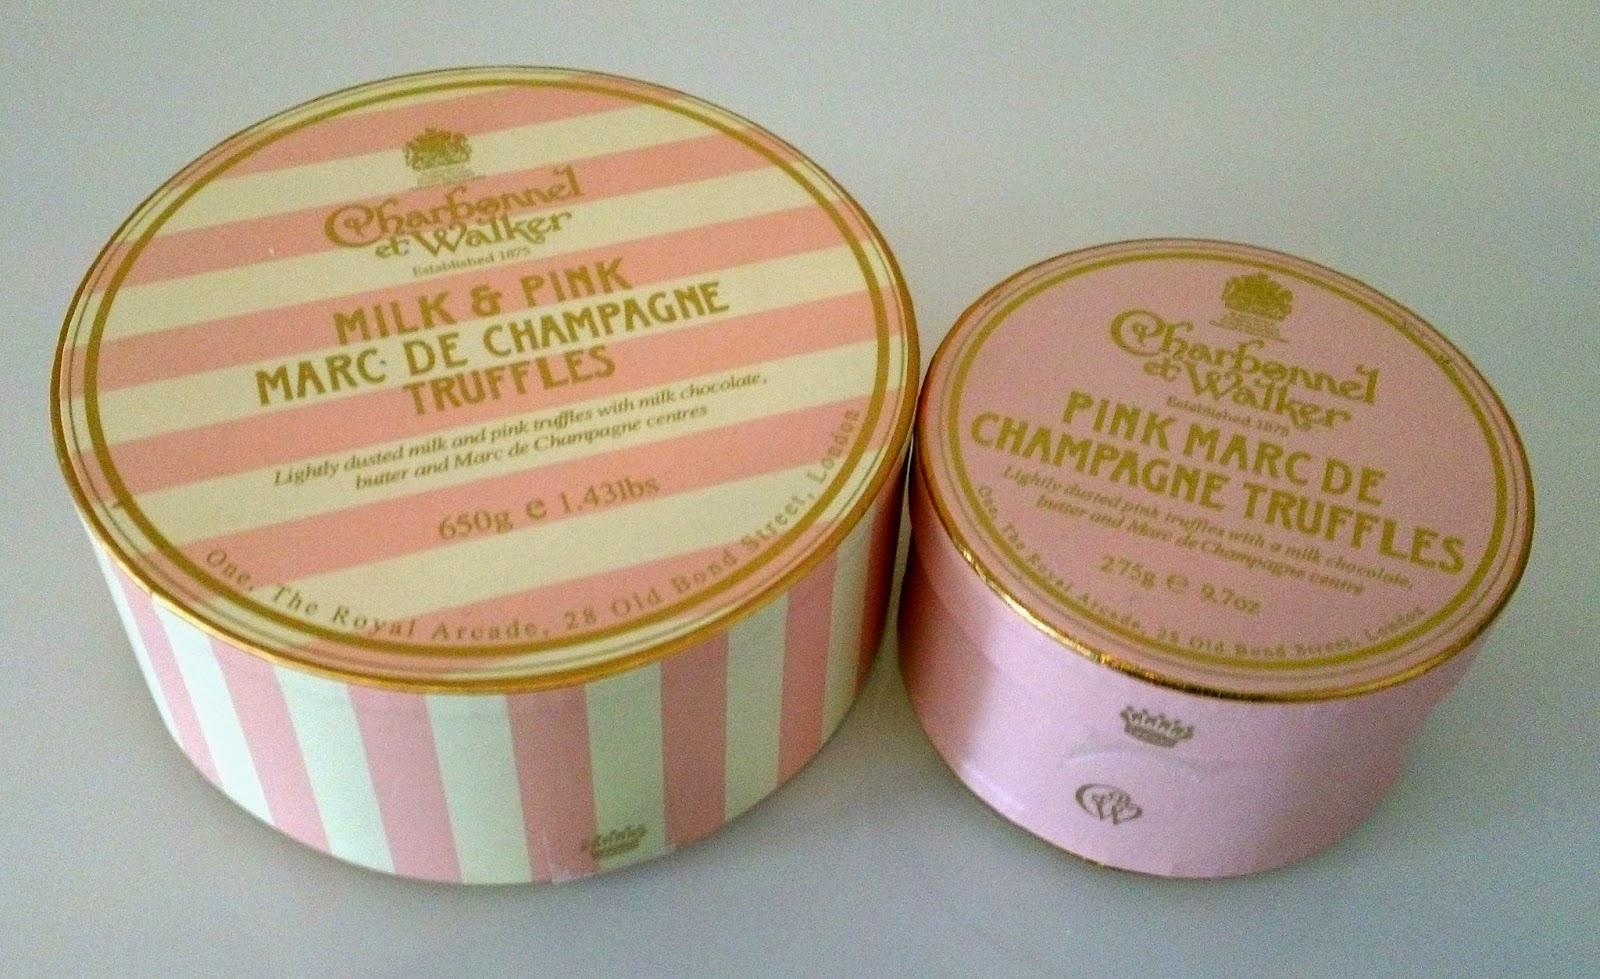 Marc De Champage Truffles, Pink Marc De Champagne Truffles, Charbonnel et Walker, Handmade Chocolates, Chocolatier, Champagne Truffles